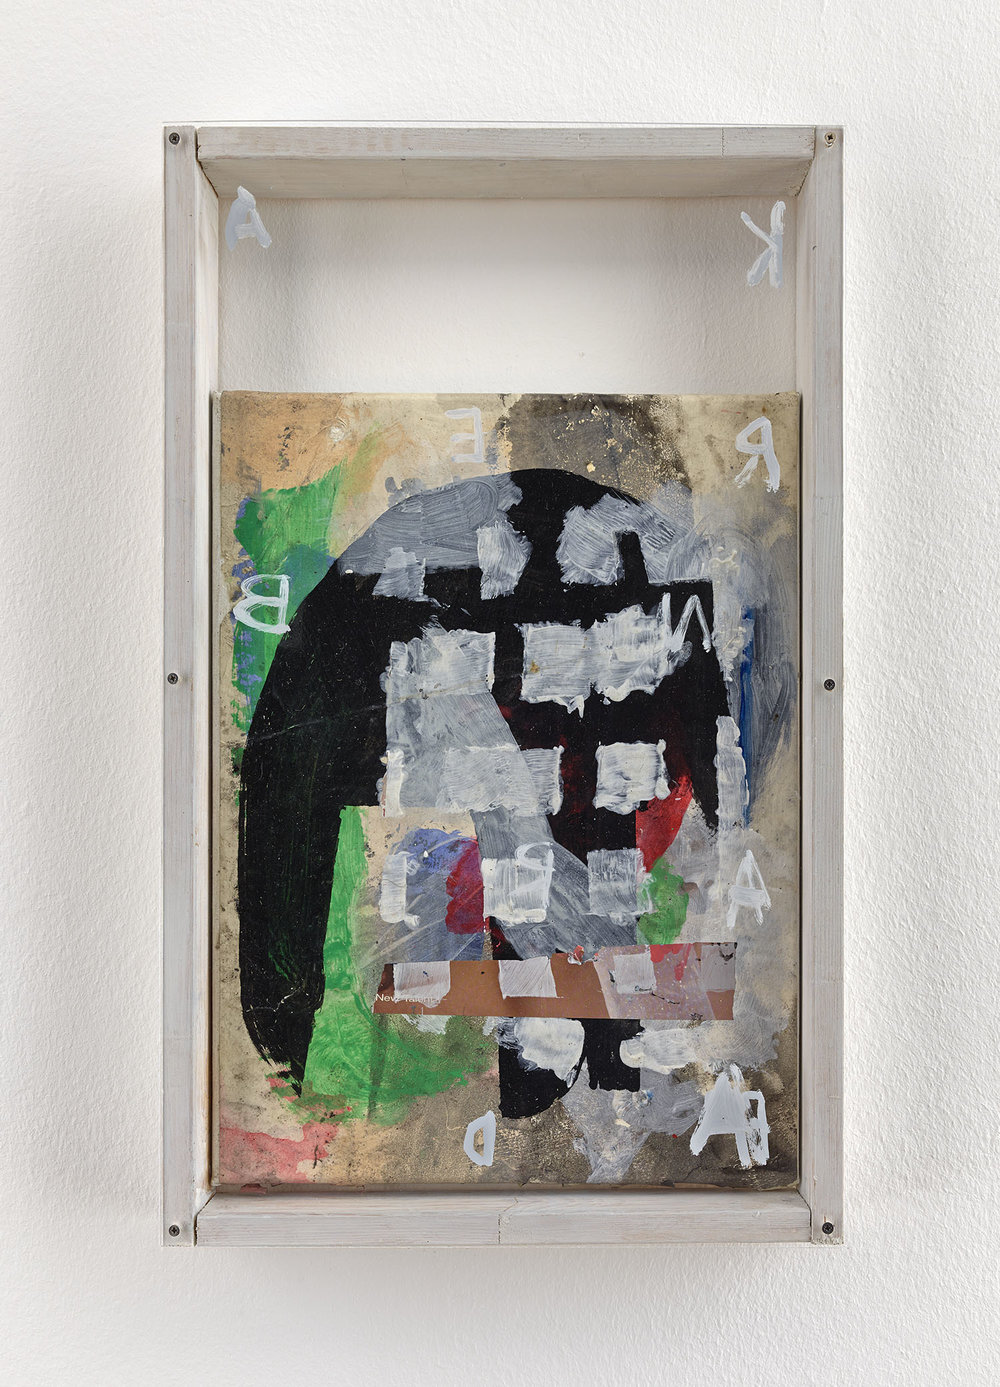 o.T. (Karen Barad) | 2015 |Papier auf Leinwand, Lack, Acryl, Holz, Plexiglas |127 x 211 cm